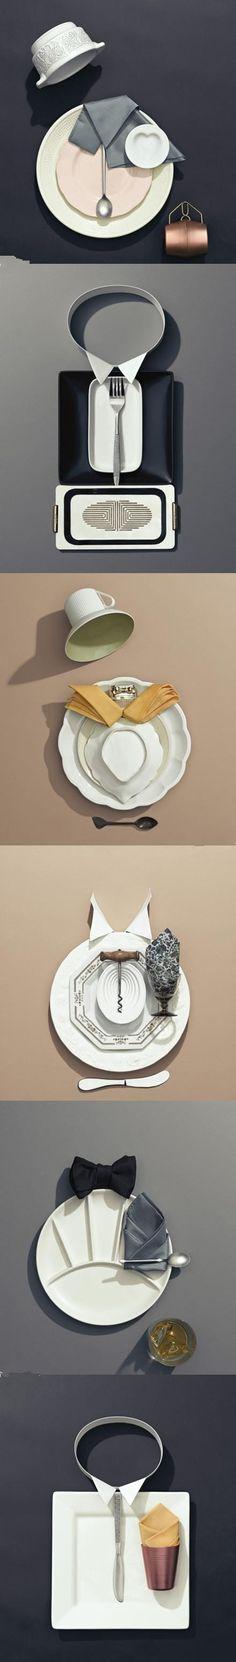 6 dinner table setting designs